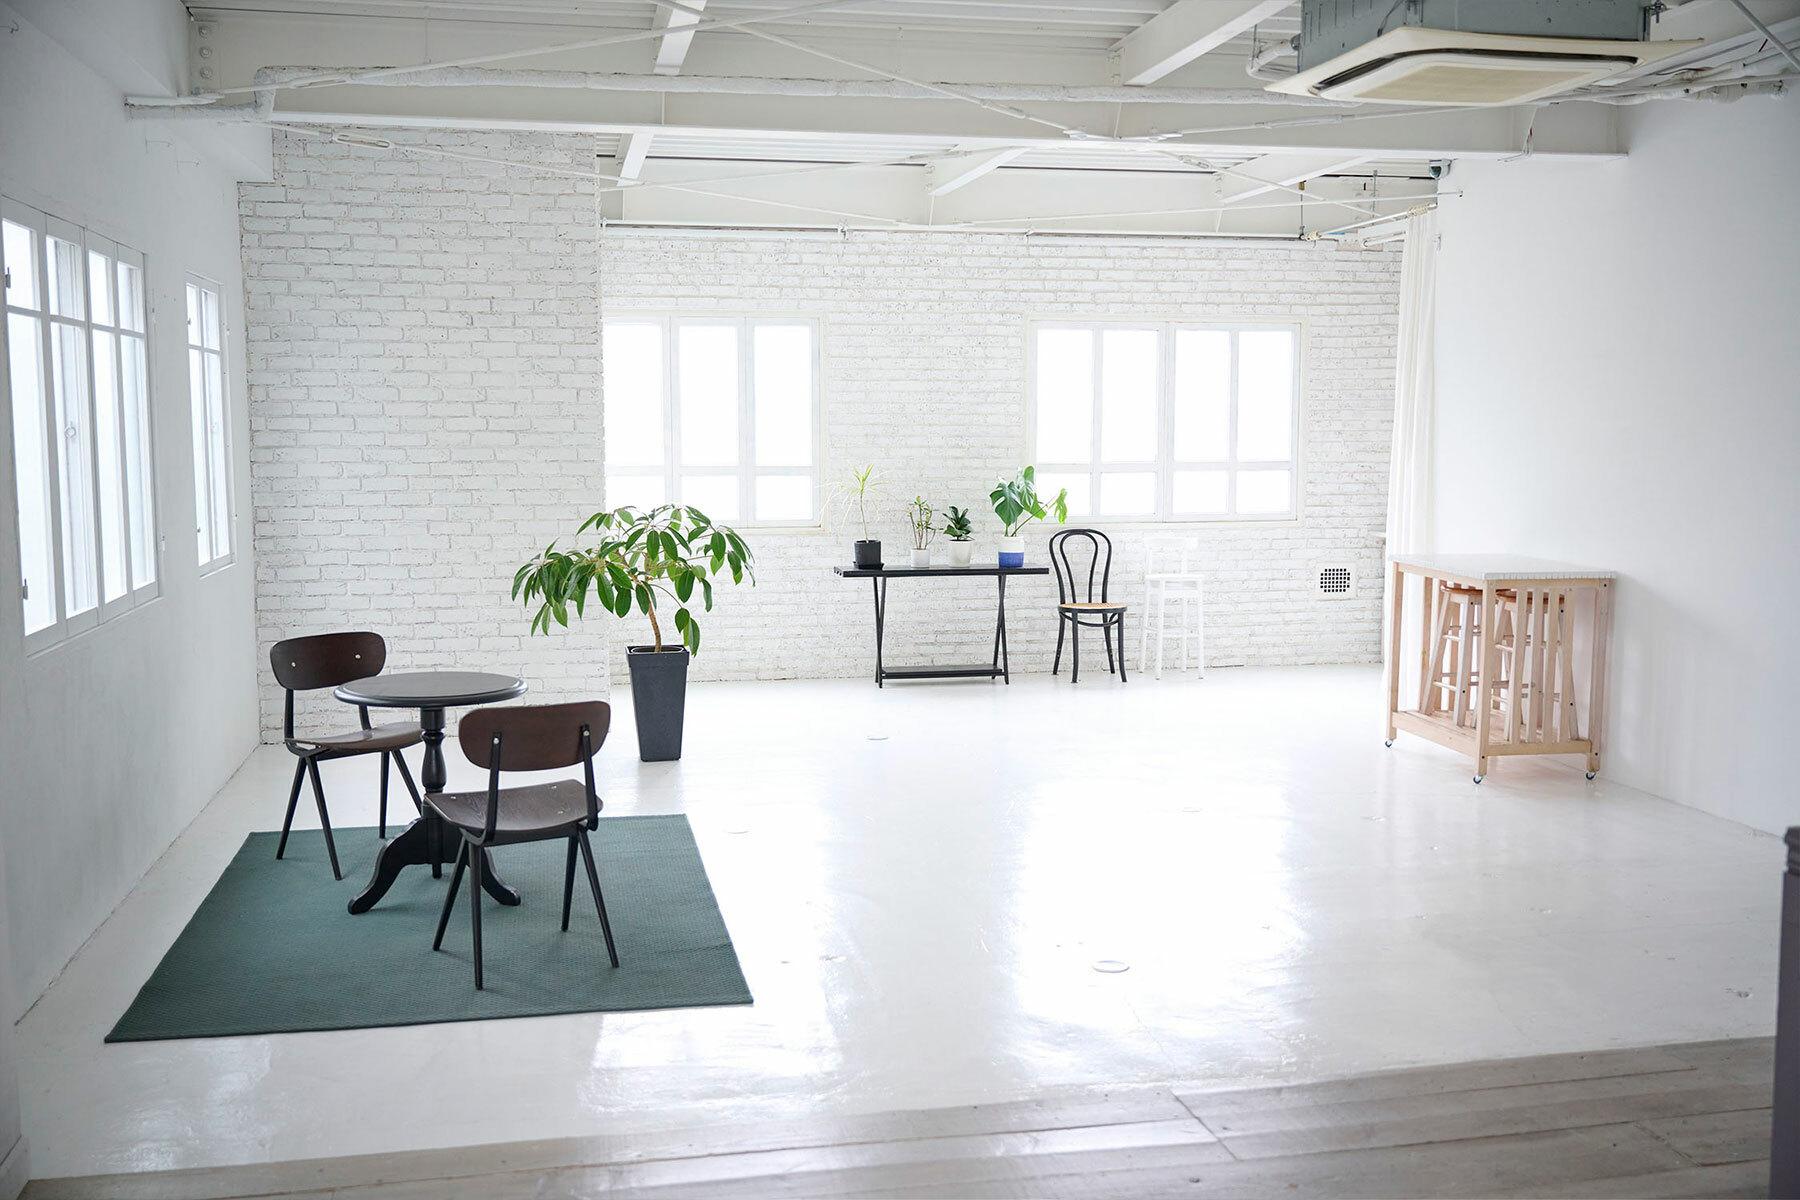 STUDIO FOGLIA 2st (スタジオ フォグリア 2st)窓を白レンガで塞げます